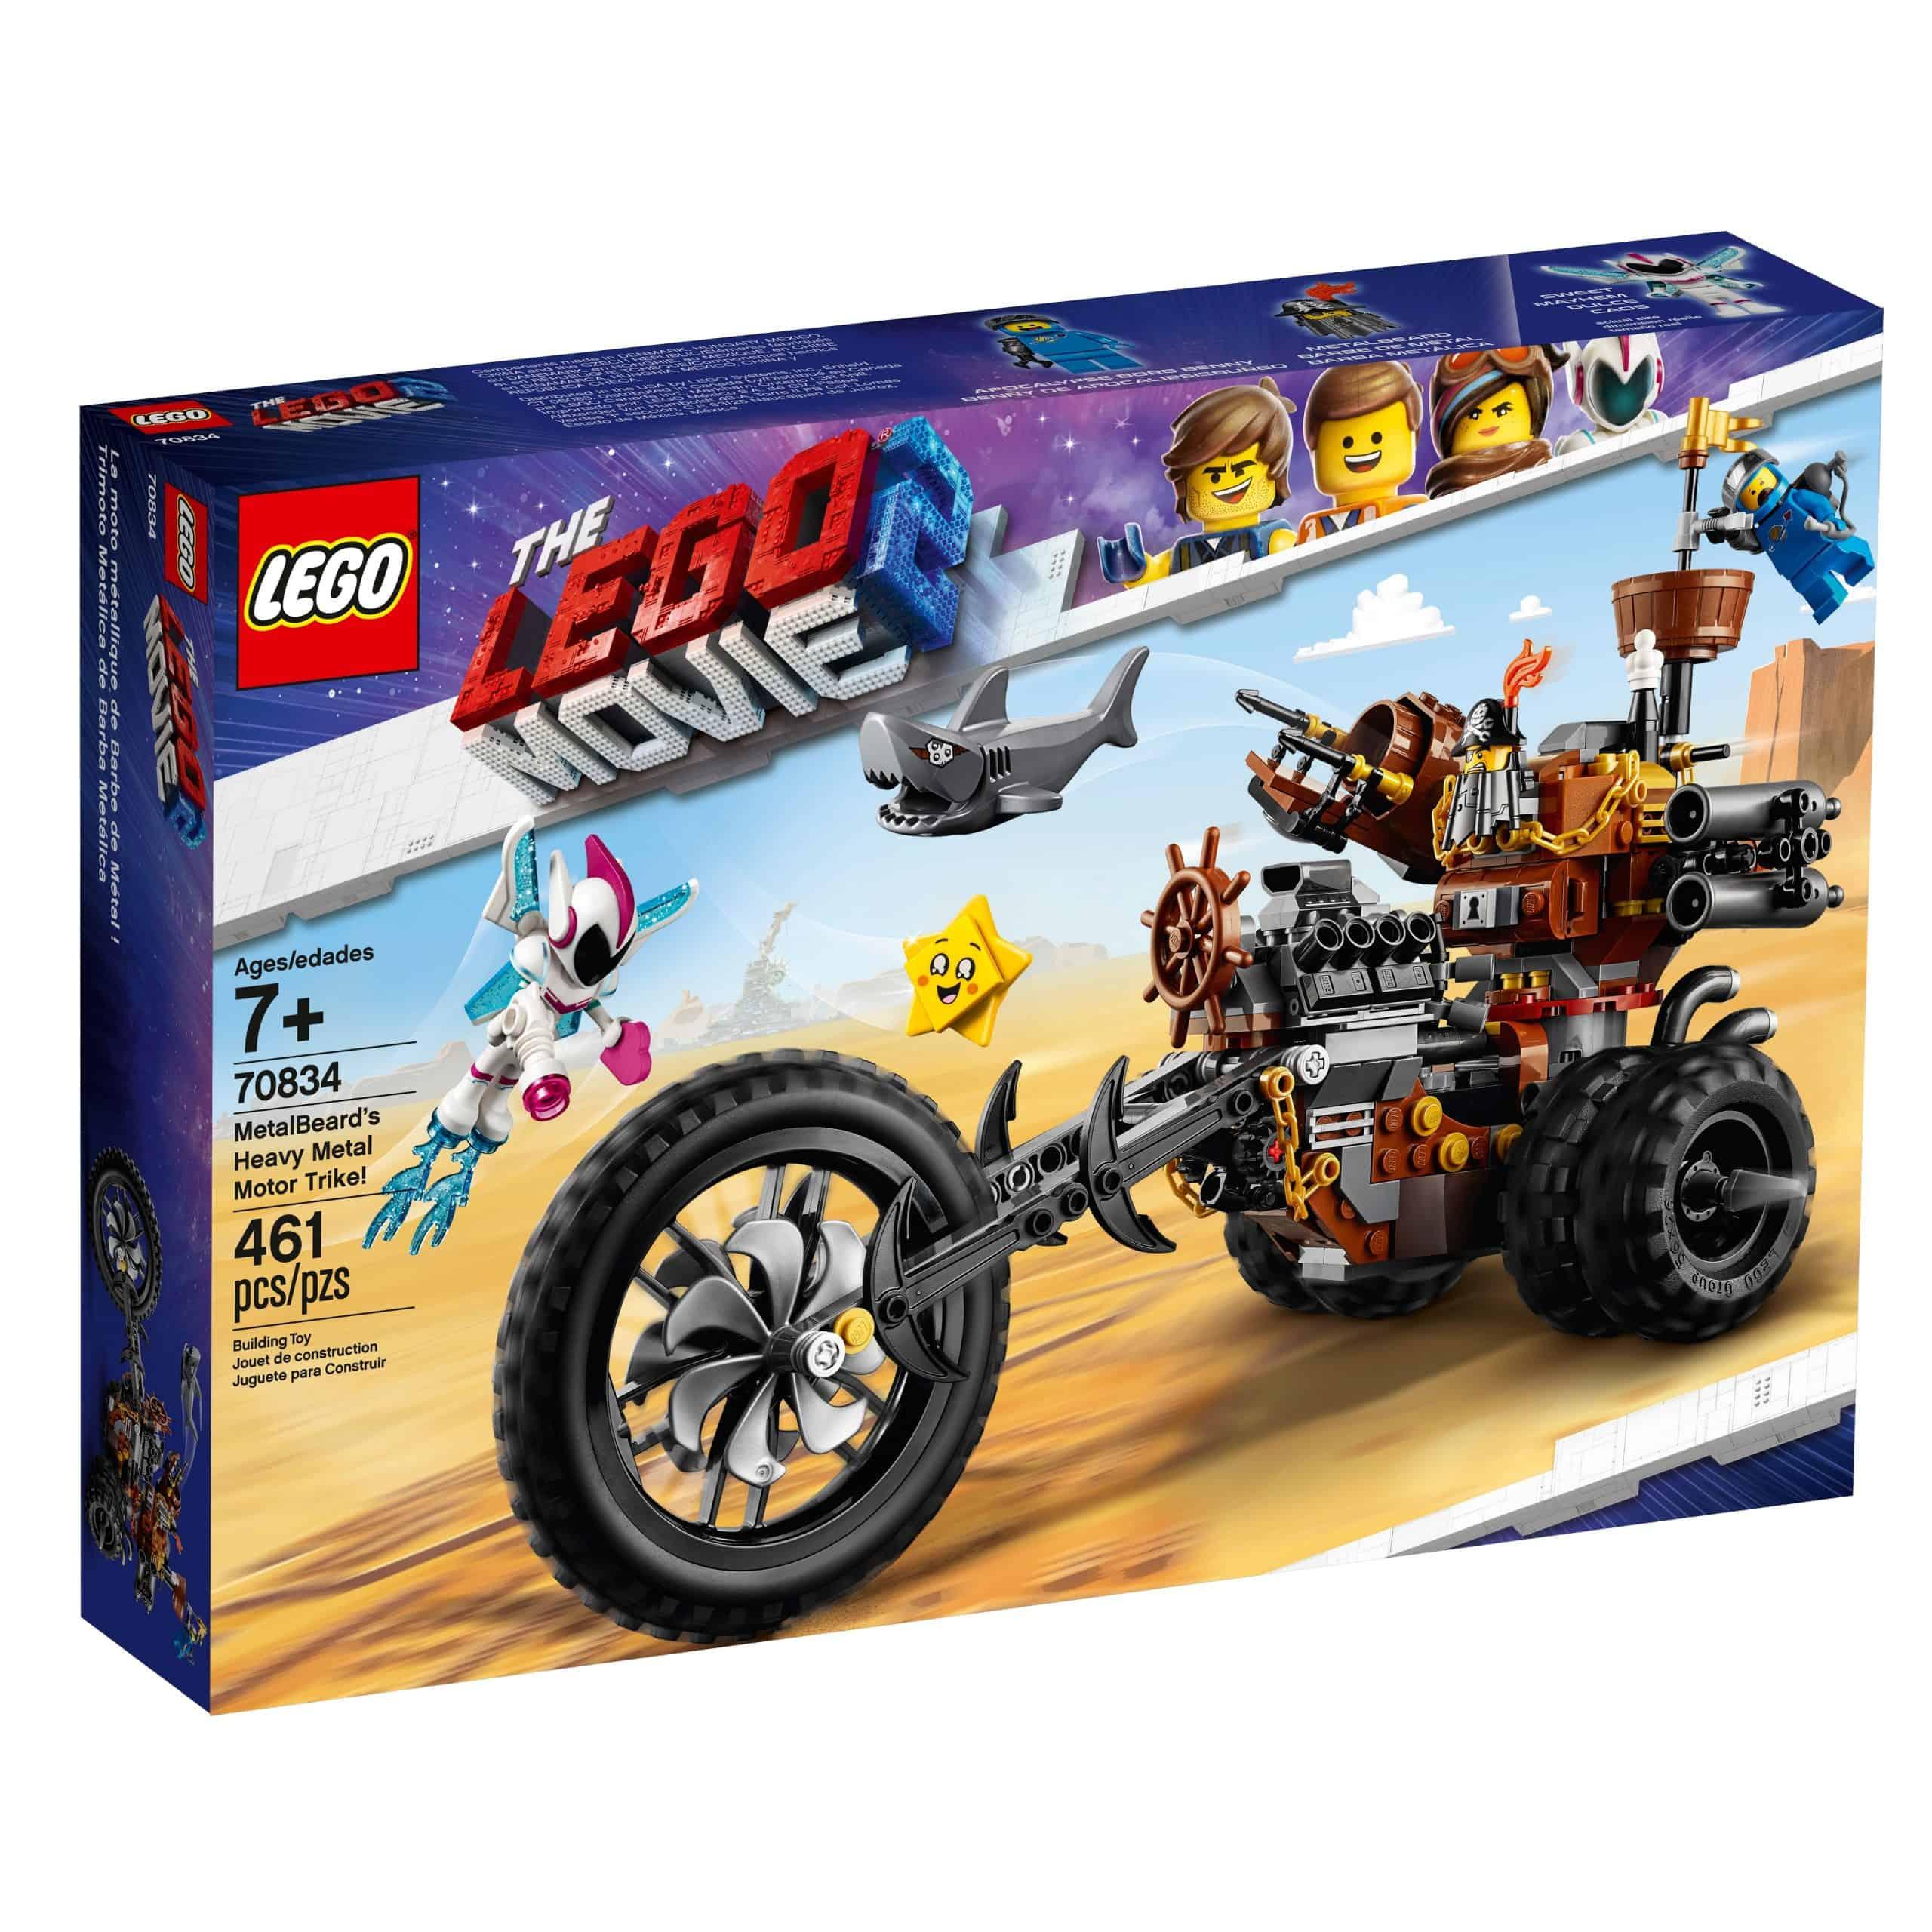 lego 70834 jernskaegs trehjulede metalmotorcykel scaled